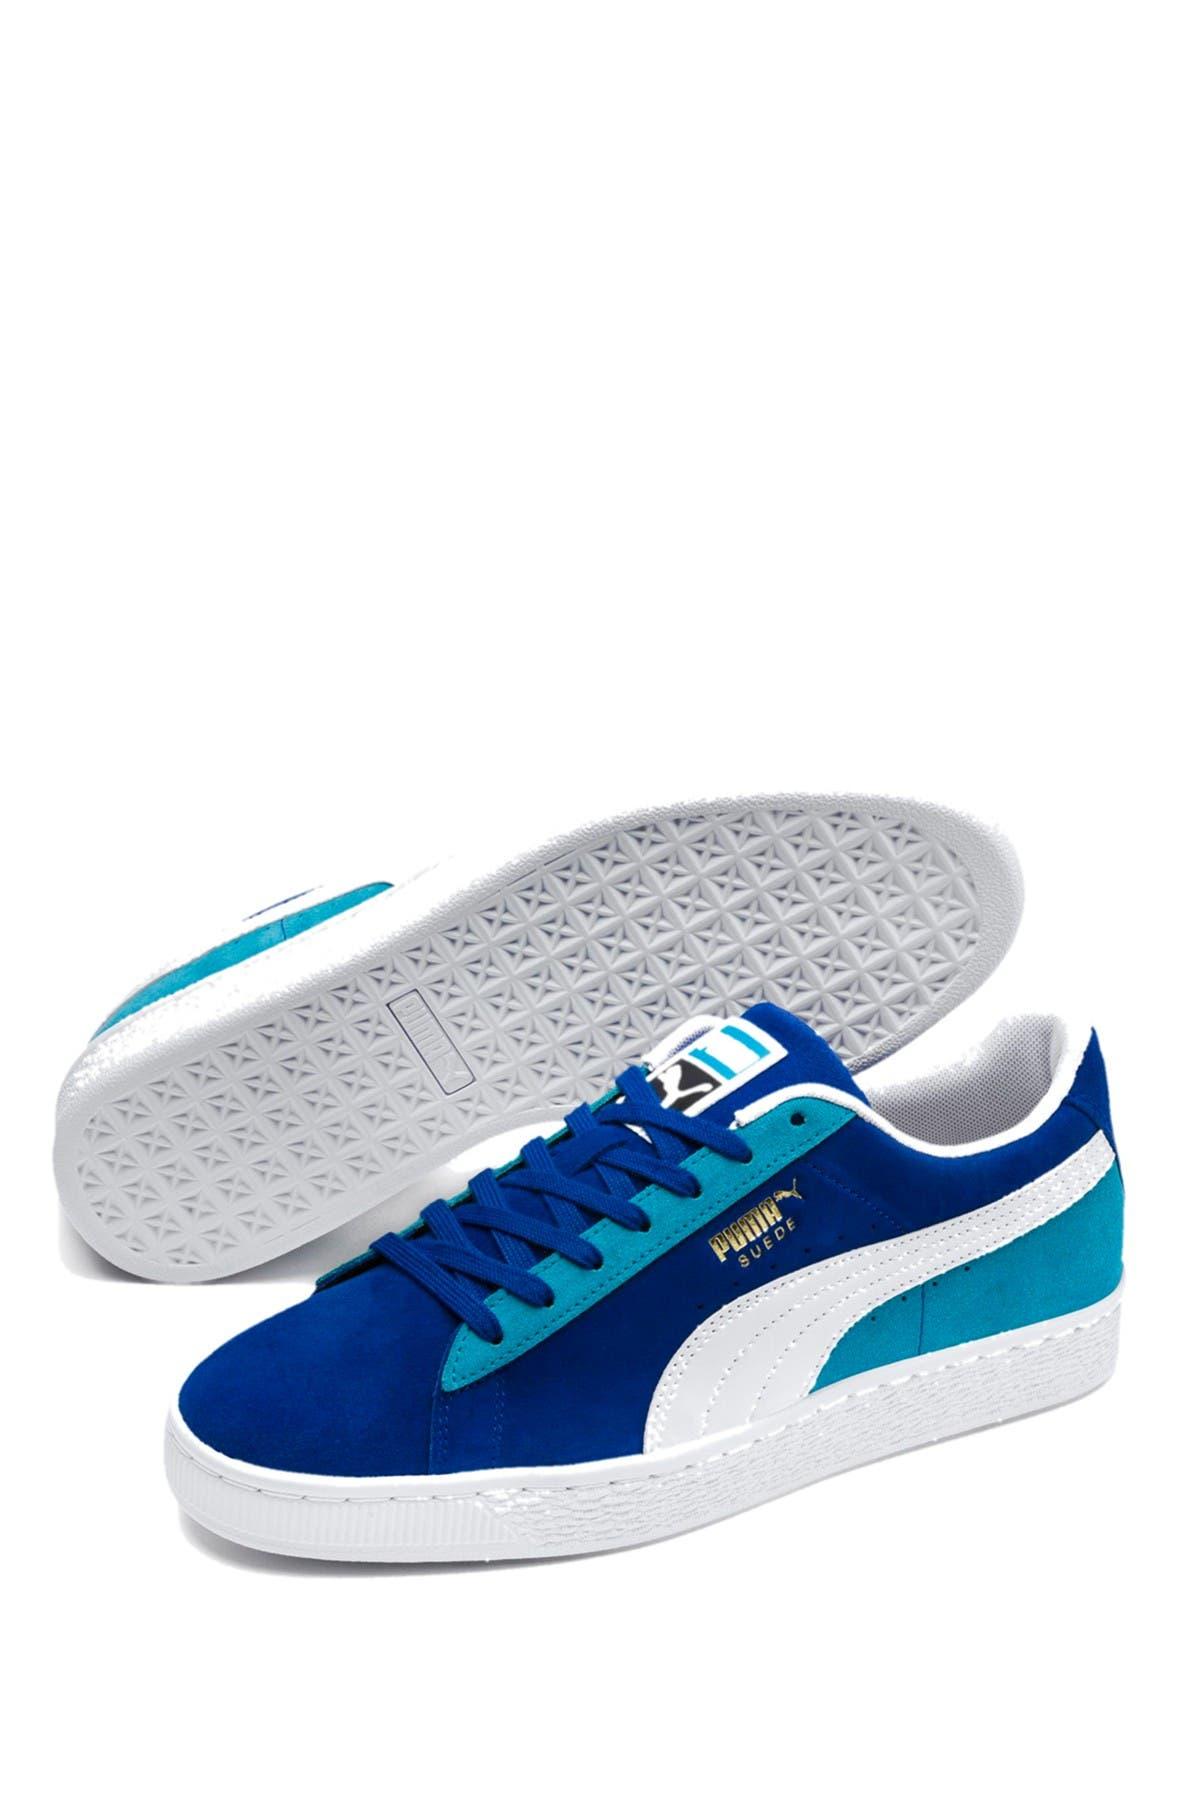 PUMA | Suede Classic Kokono Sneakers